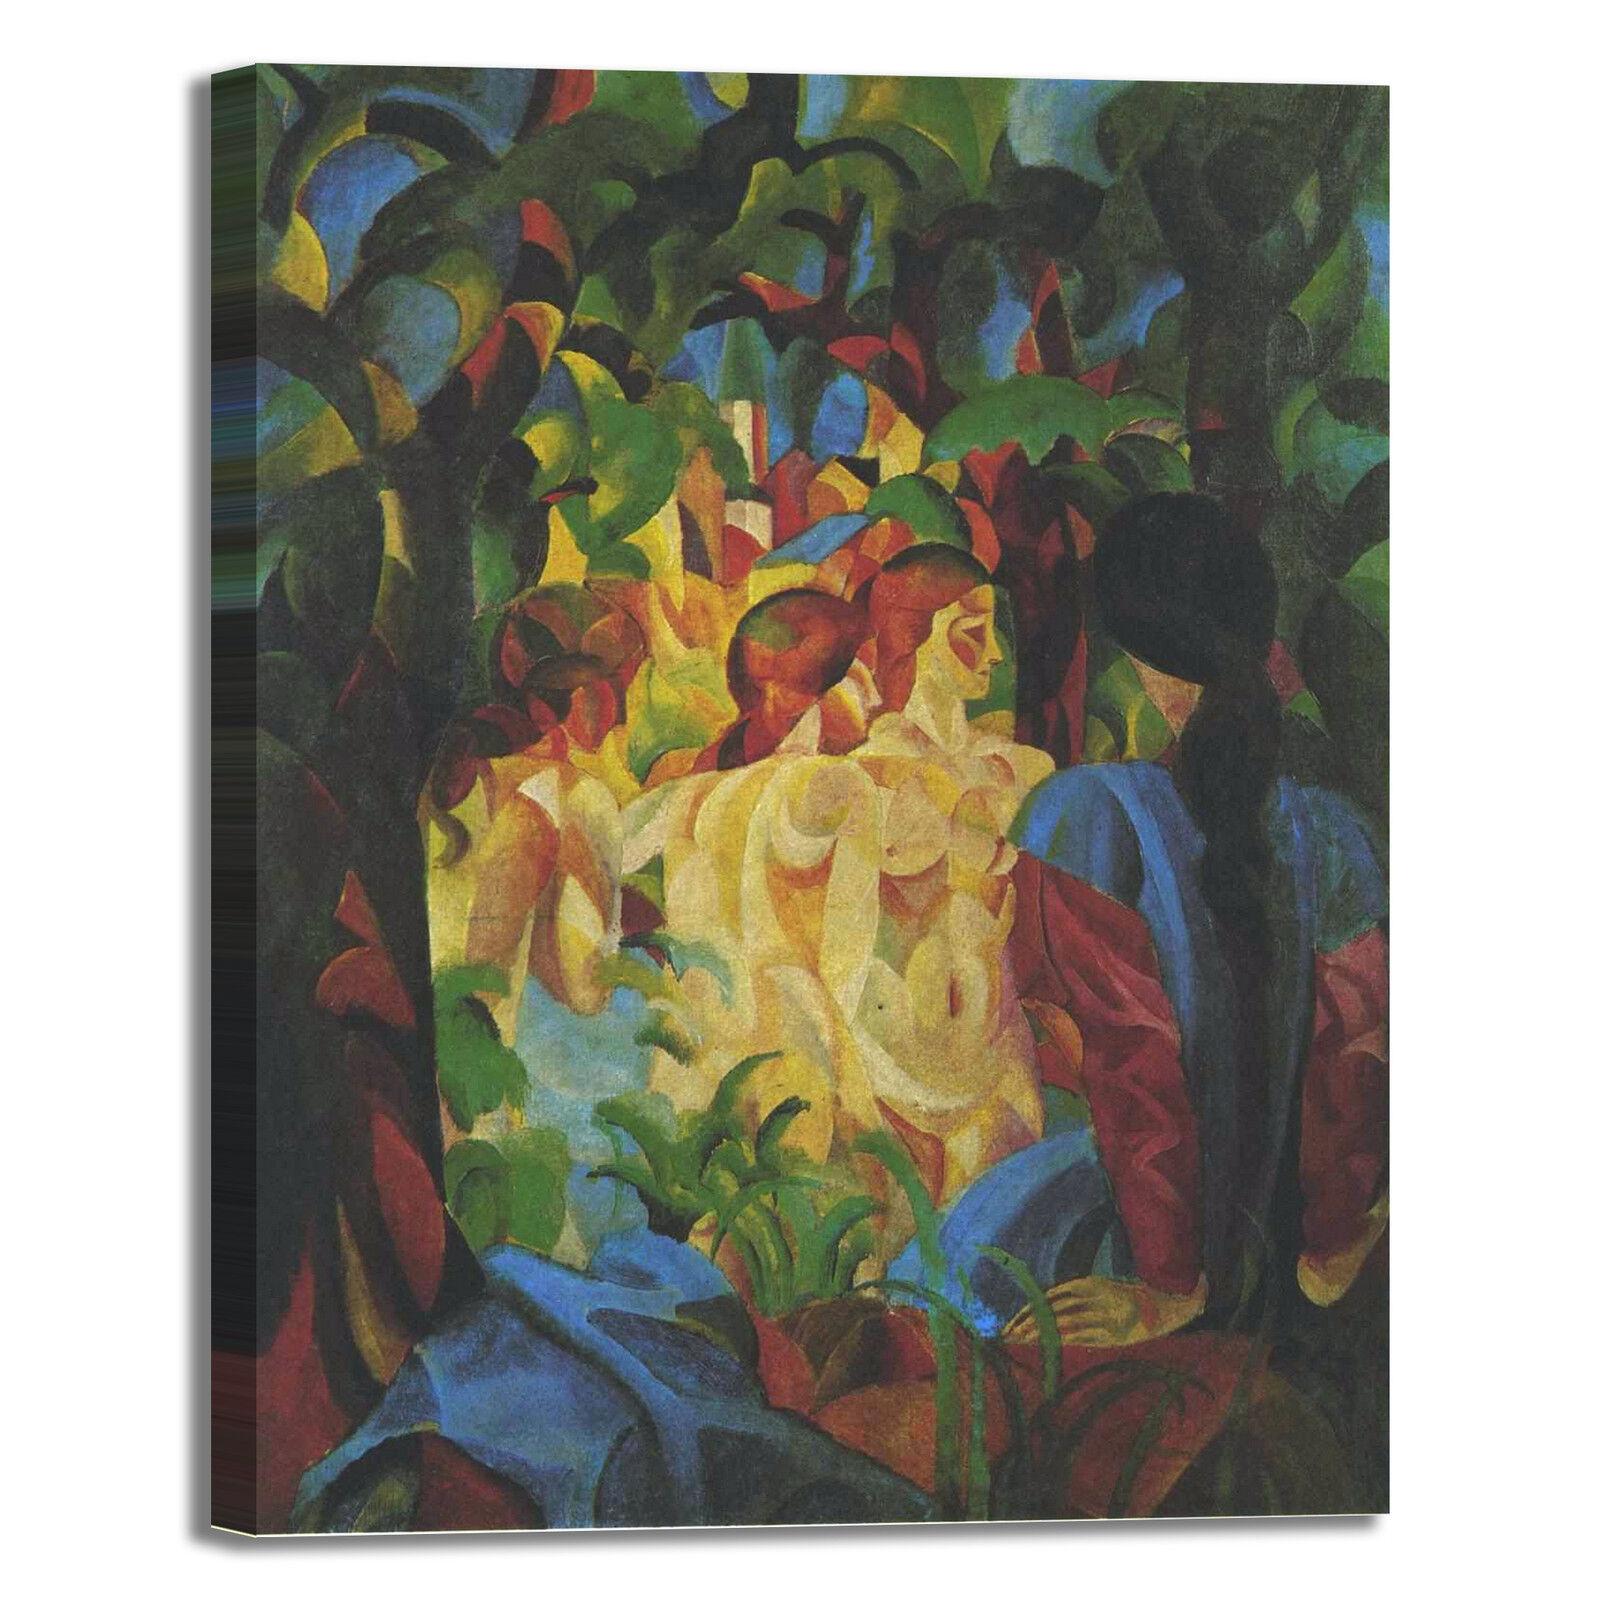 Macke ragazze fanno bagno design quadro stampa tela dipinto arRouge telaio arRouge dipinto o casa 1667e8